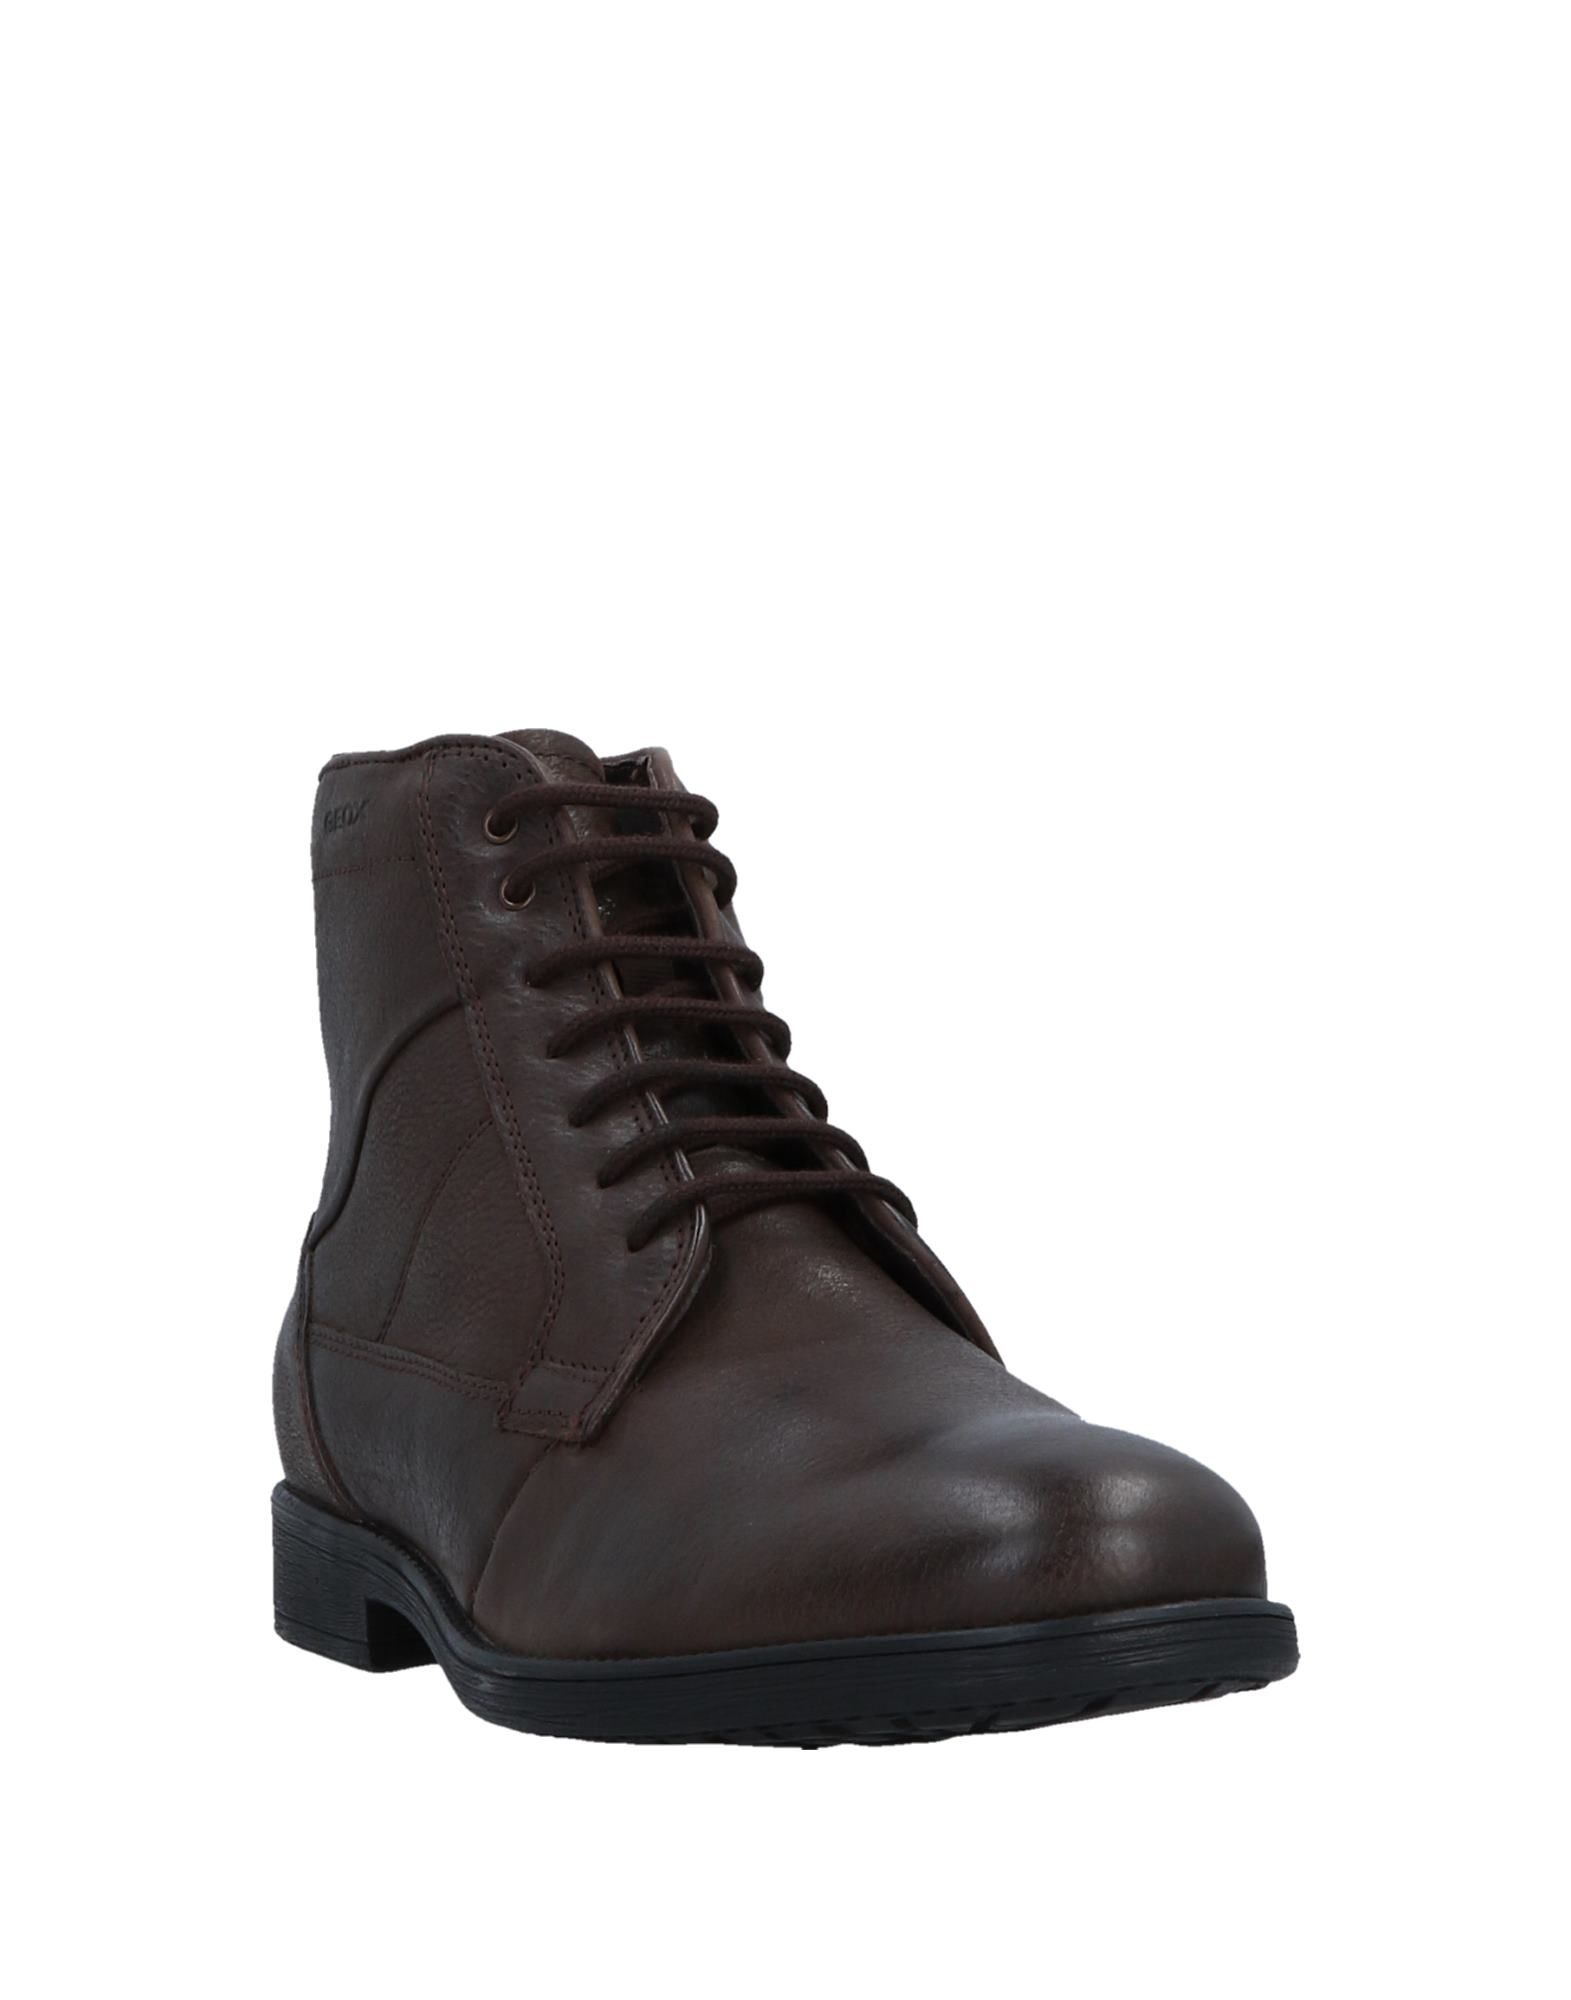 Herren Geox Stiefelette Herren   11540889UX Heiße Schuhe 8858ae